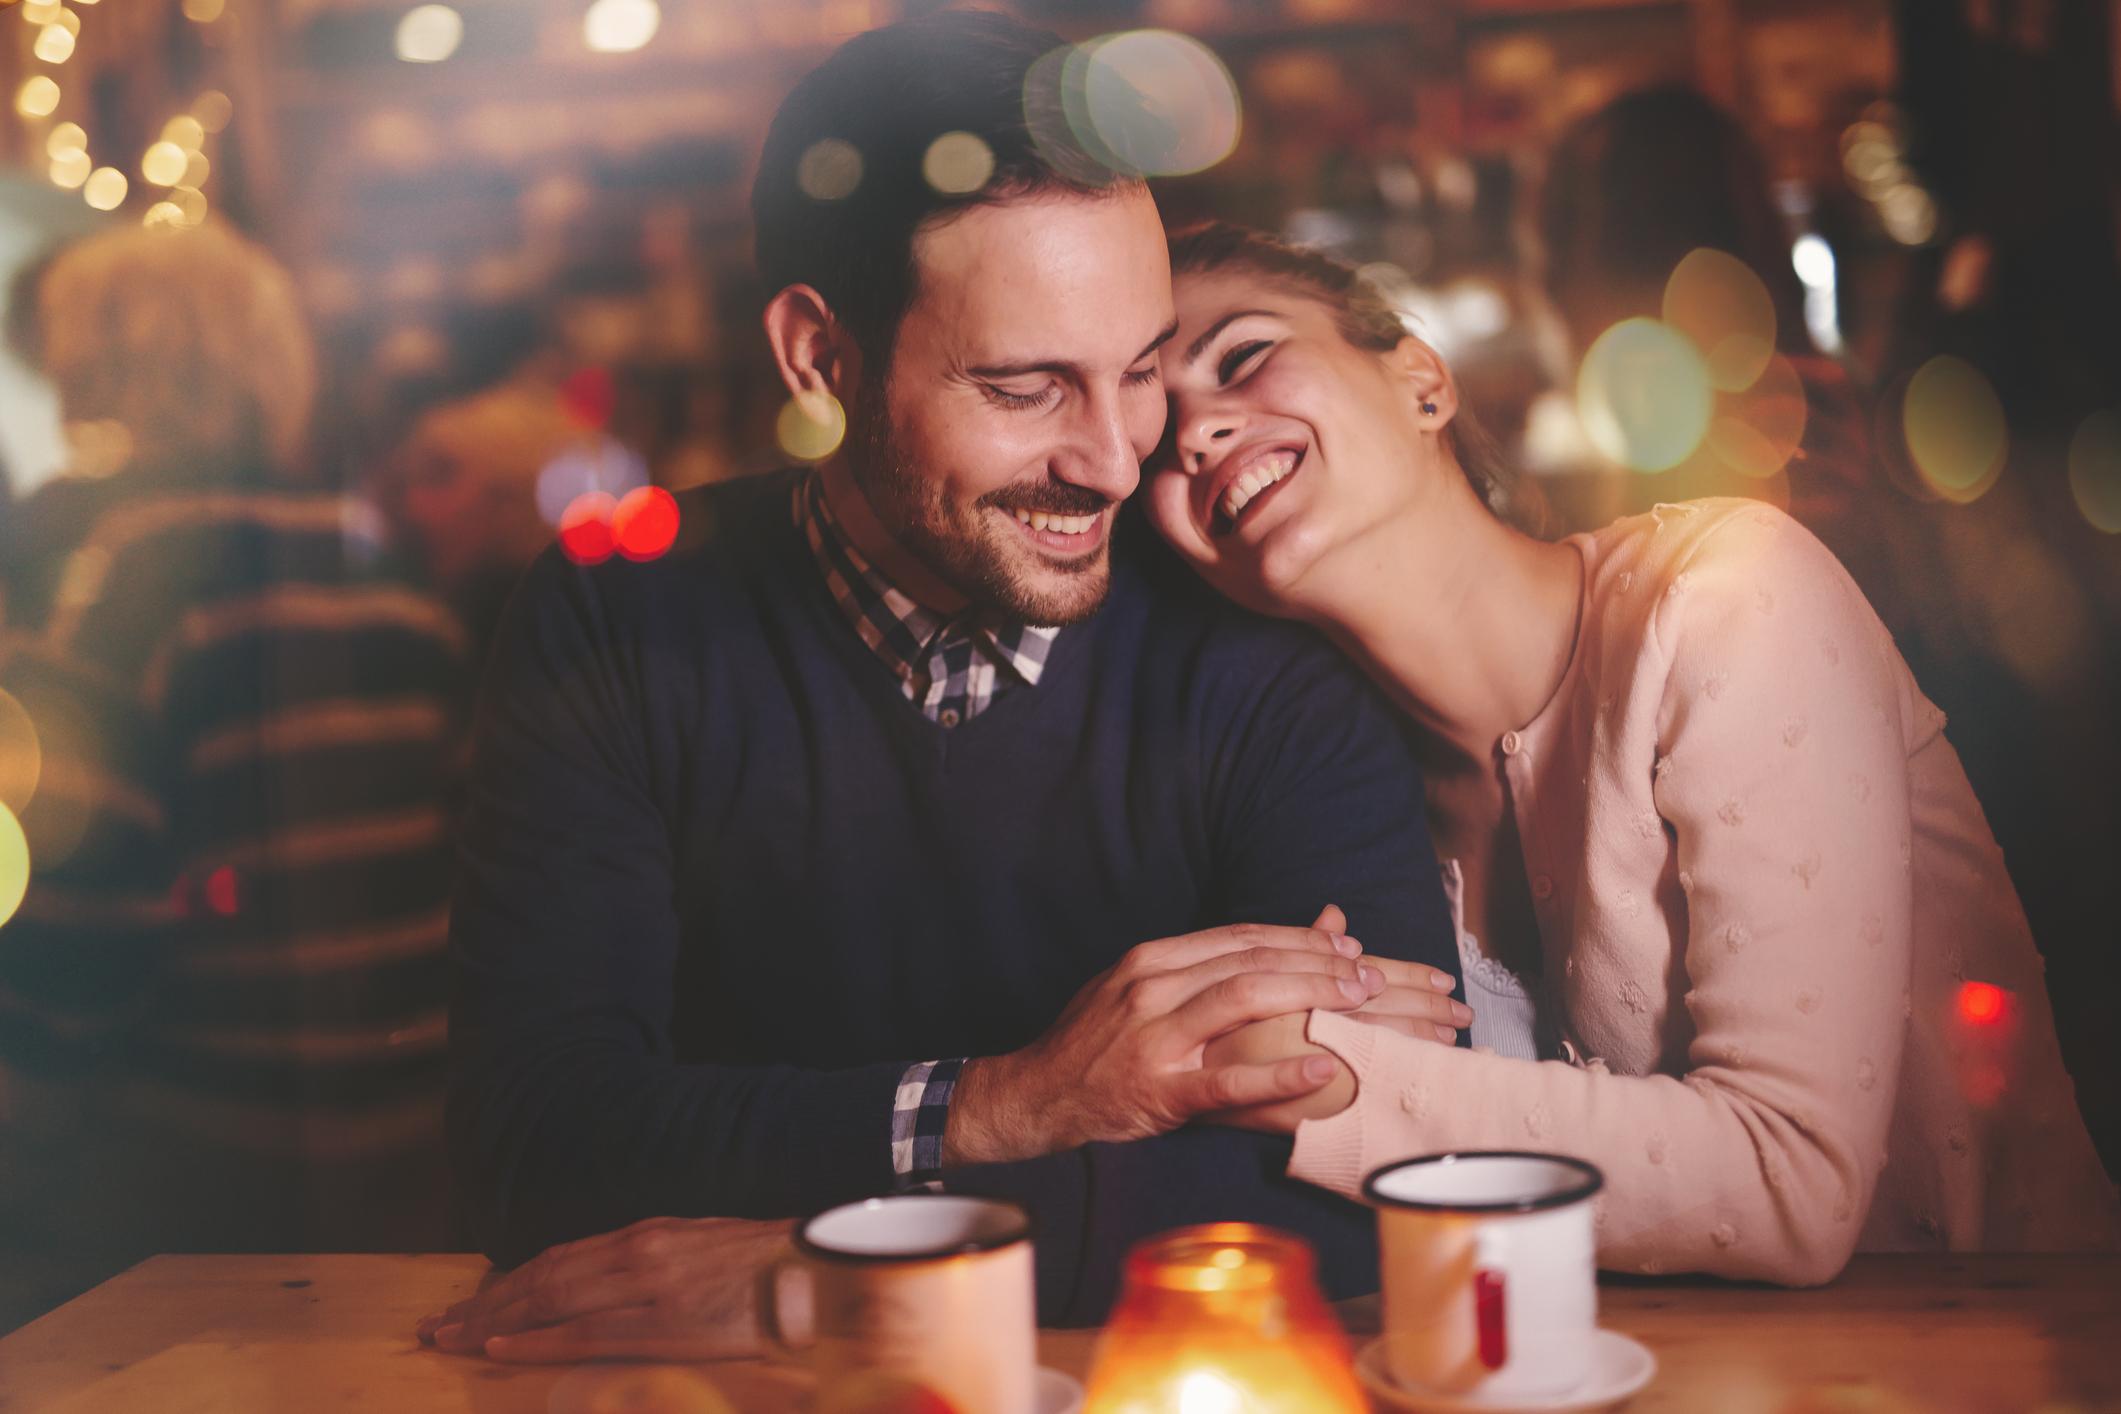 Dating-focused online international dating